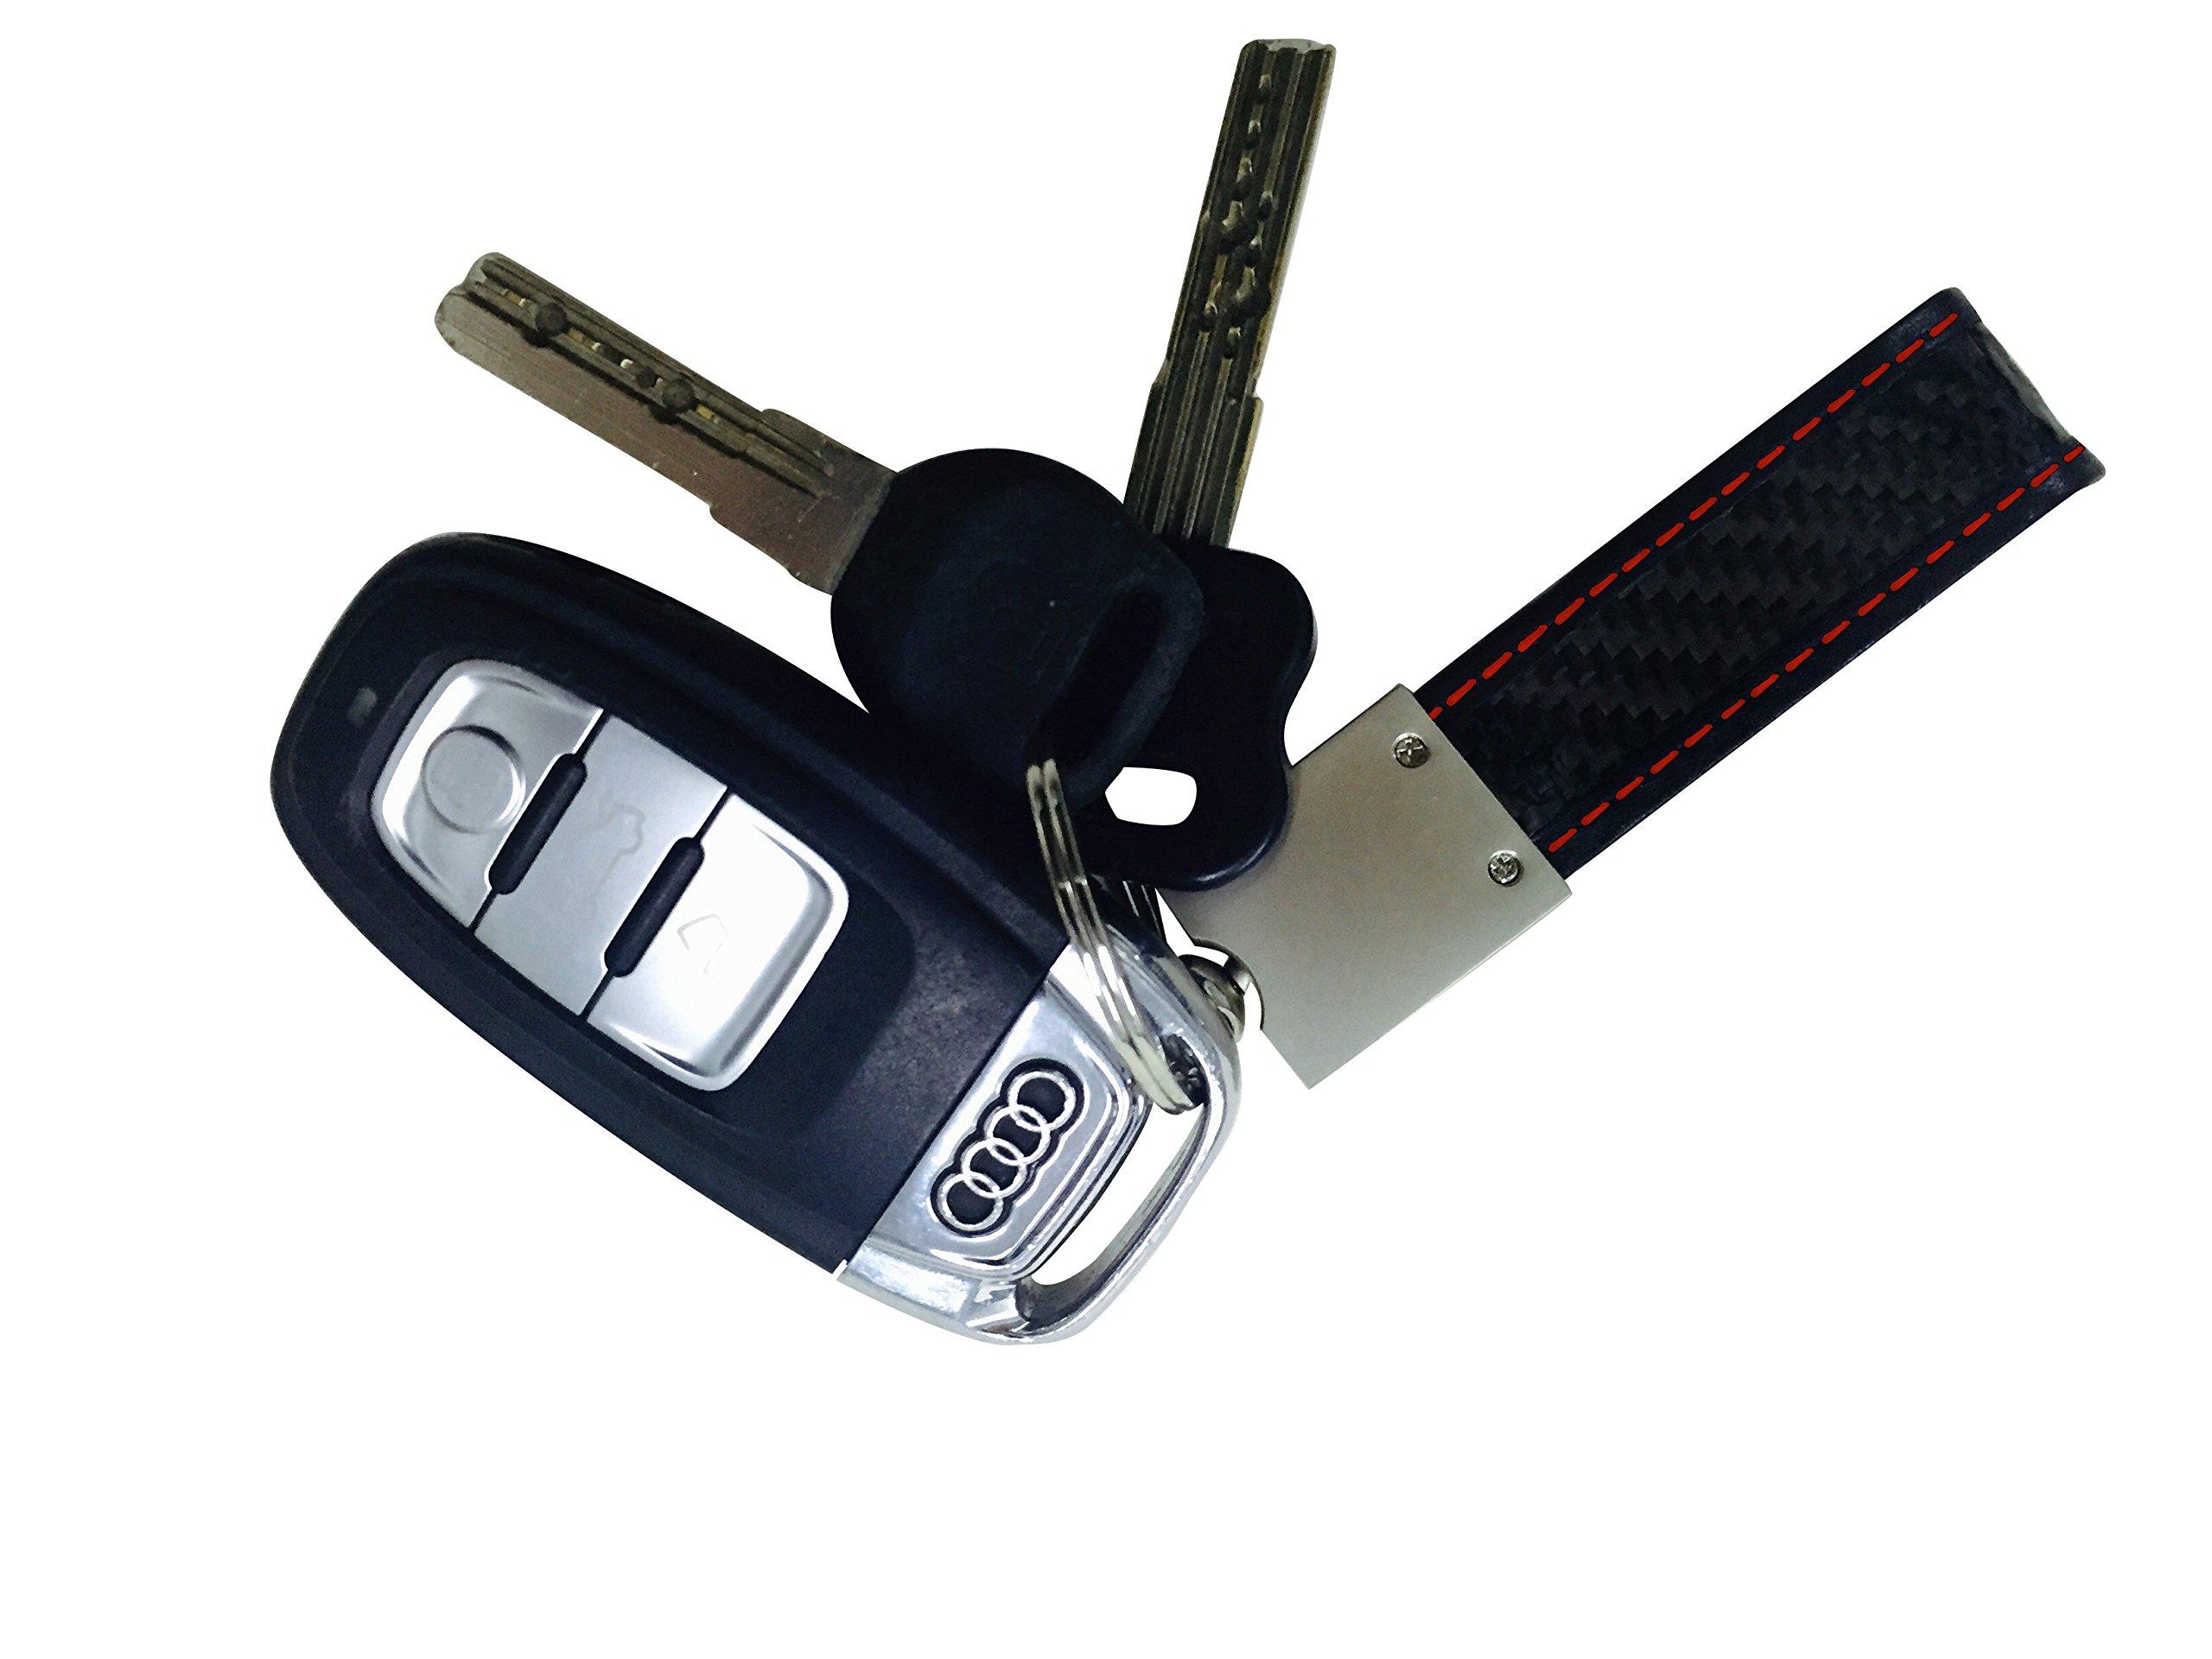 Real Carbon Fiber Keychain Elegant, MGCFTan Timeless,Key chain Red